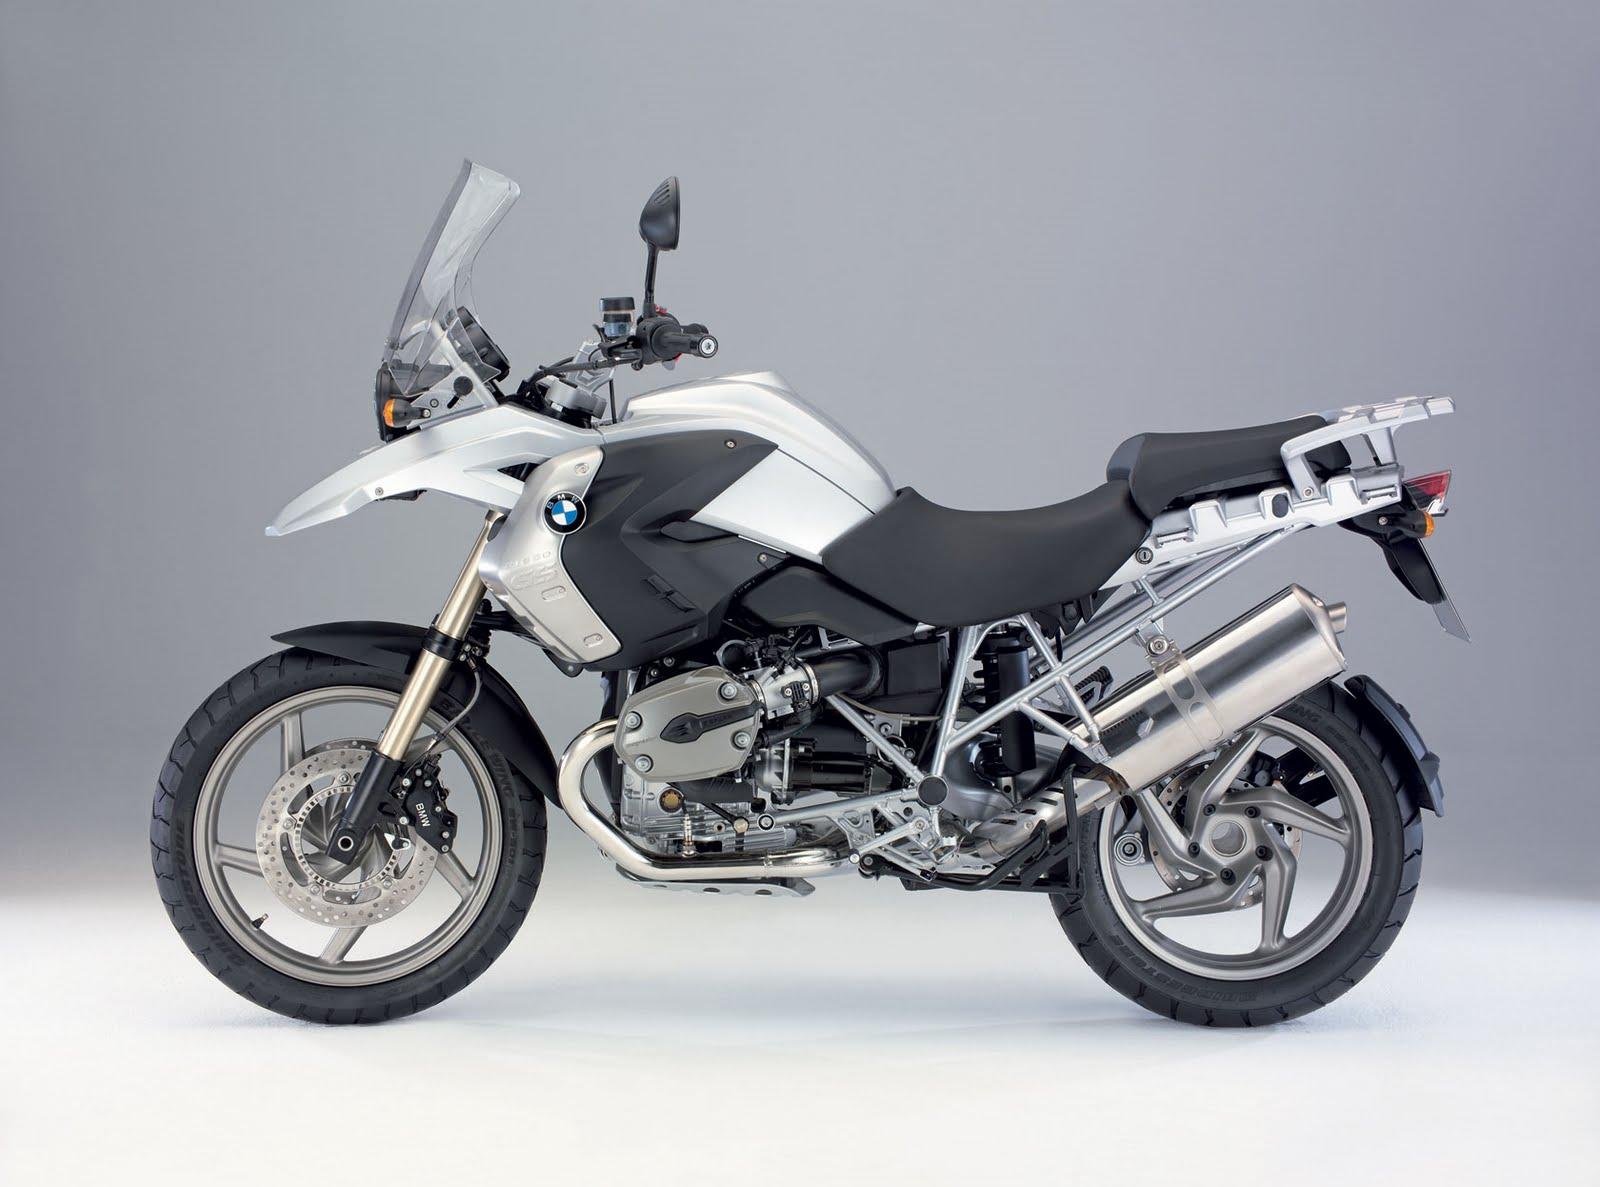 motorcycle bmw r1200gs rider | honda motorcycles trend mode motorbike